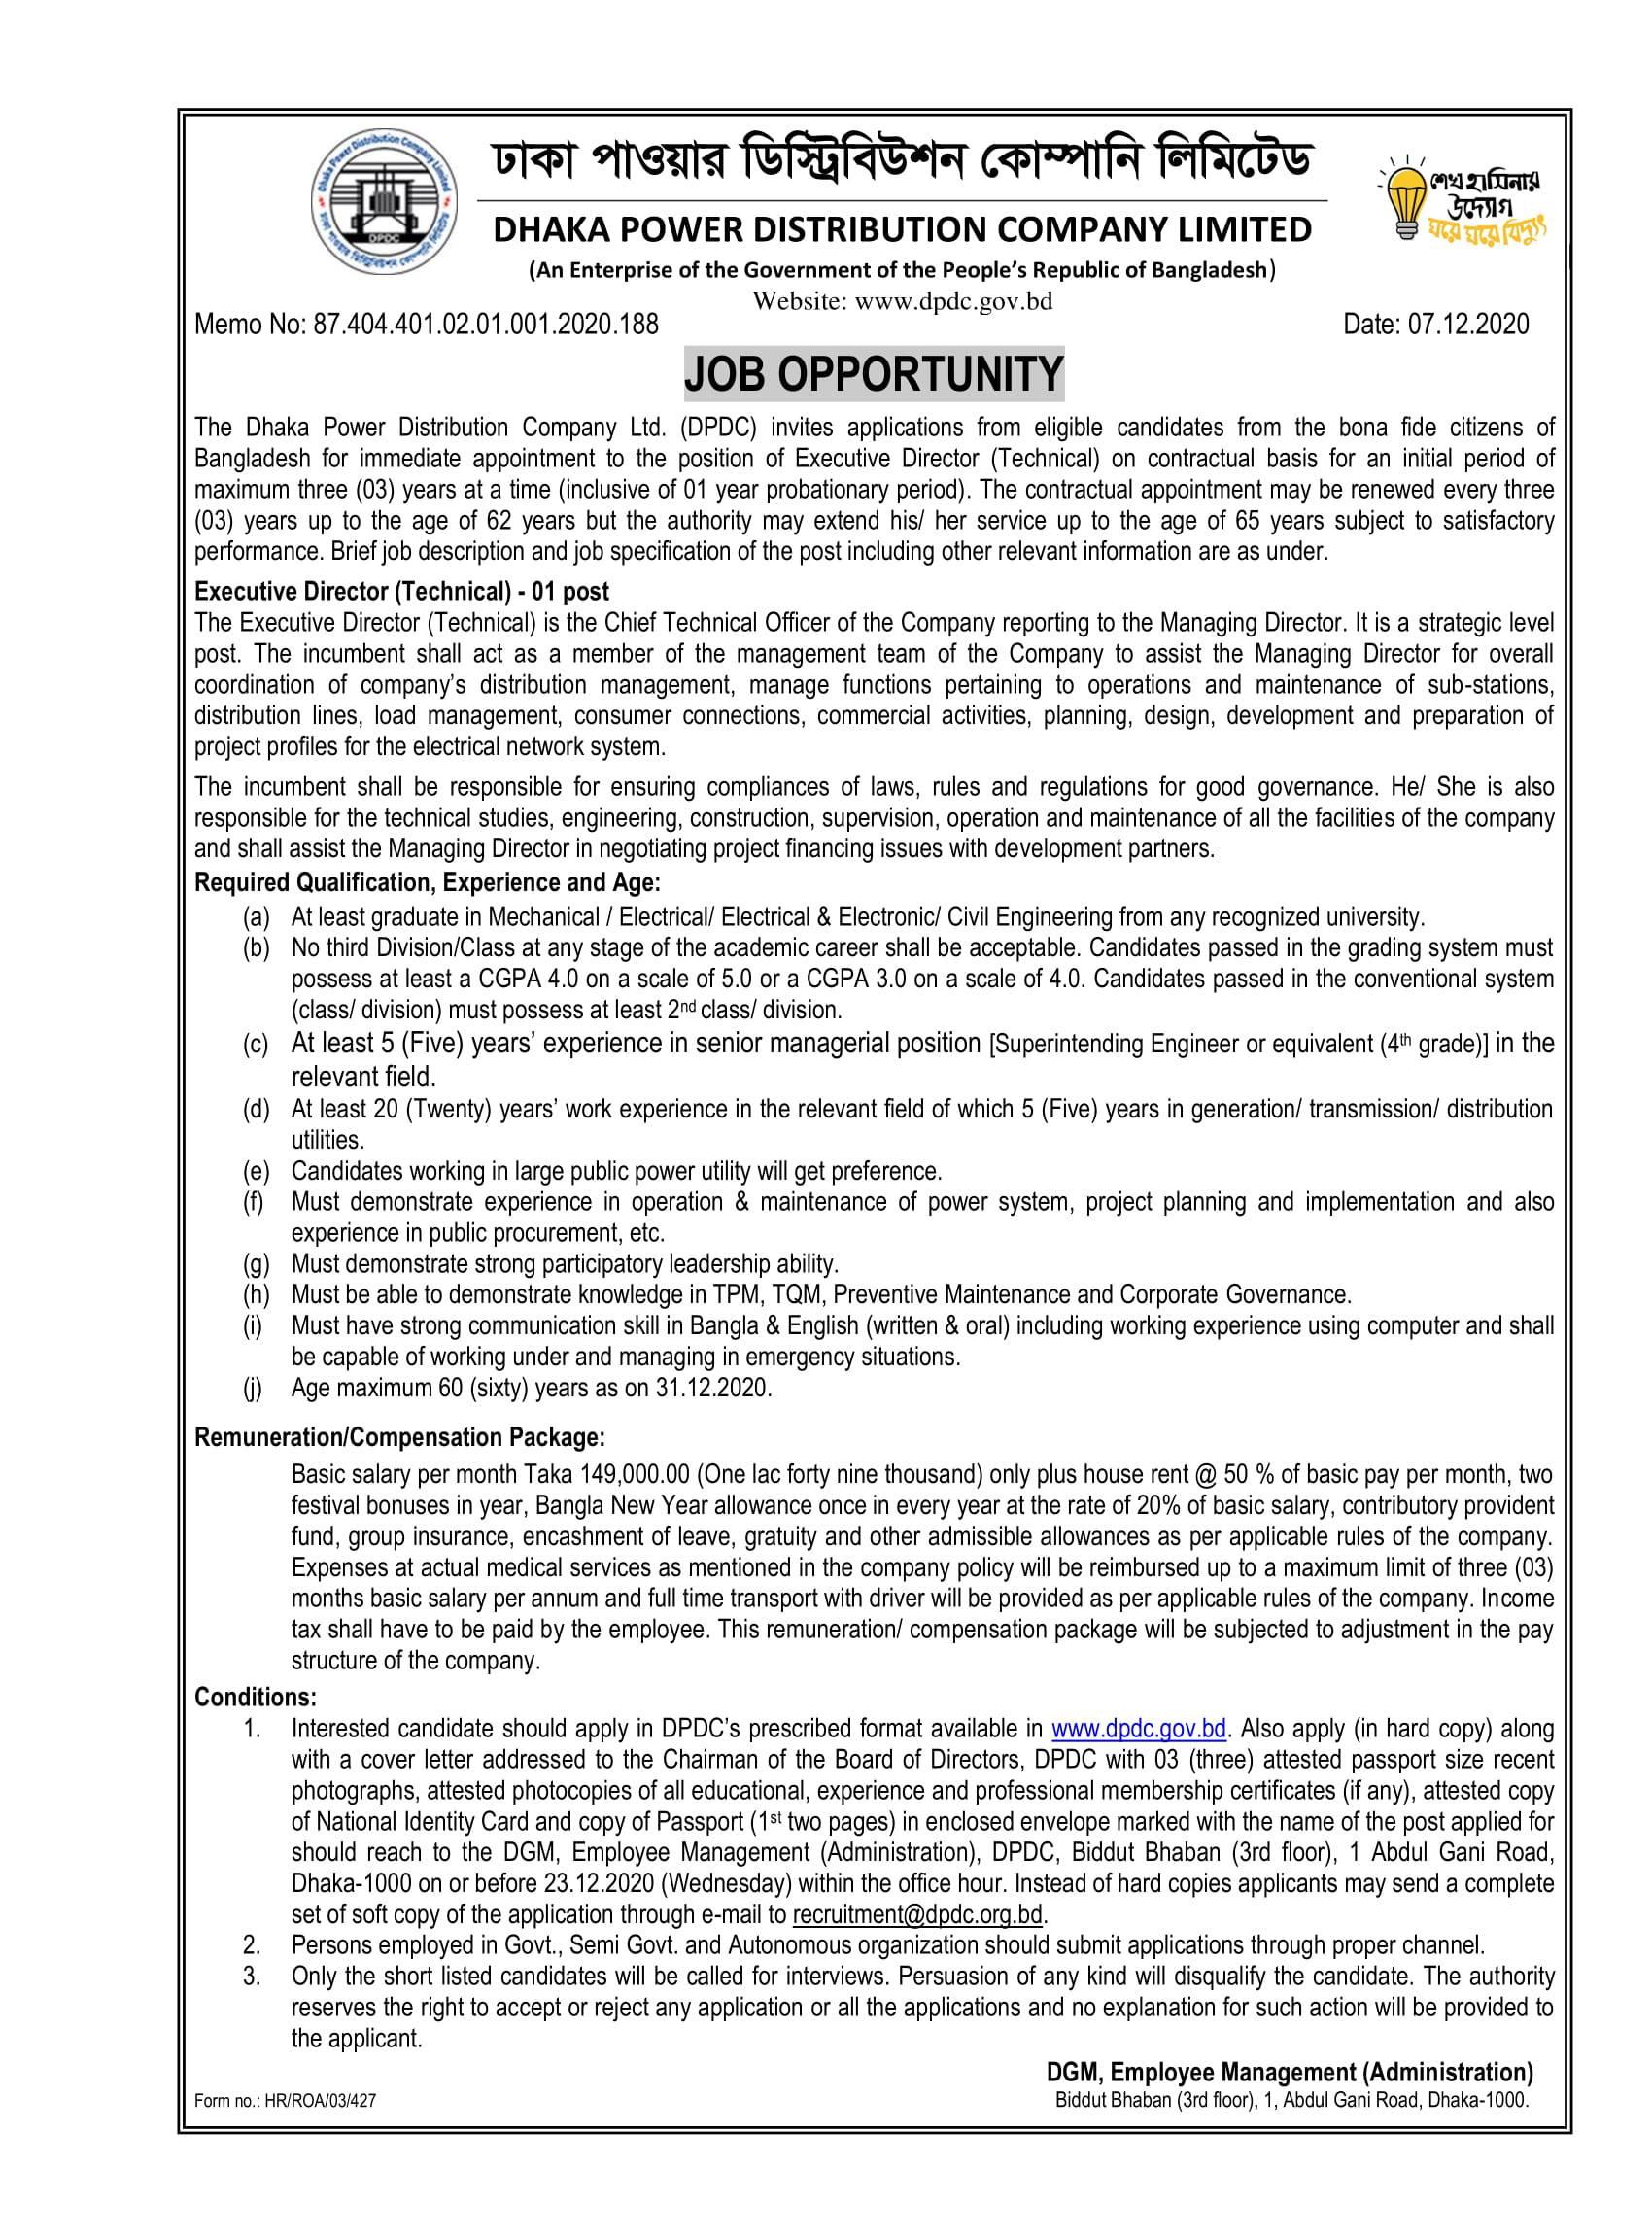 DPDC Job Circular 2020